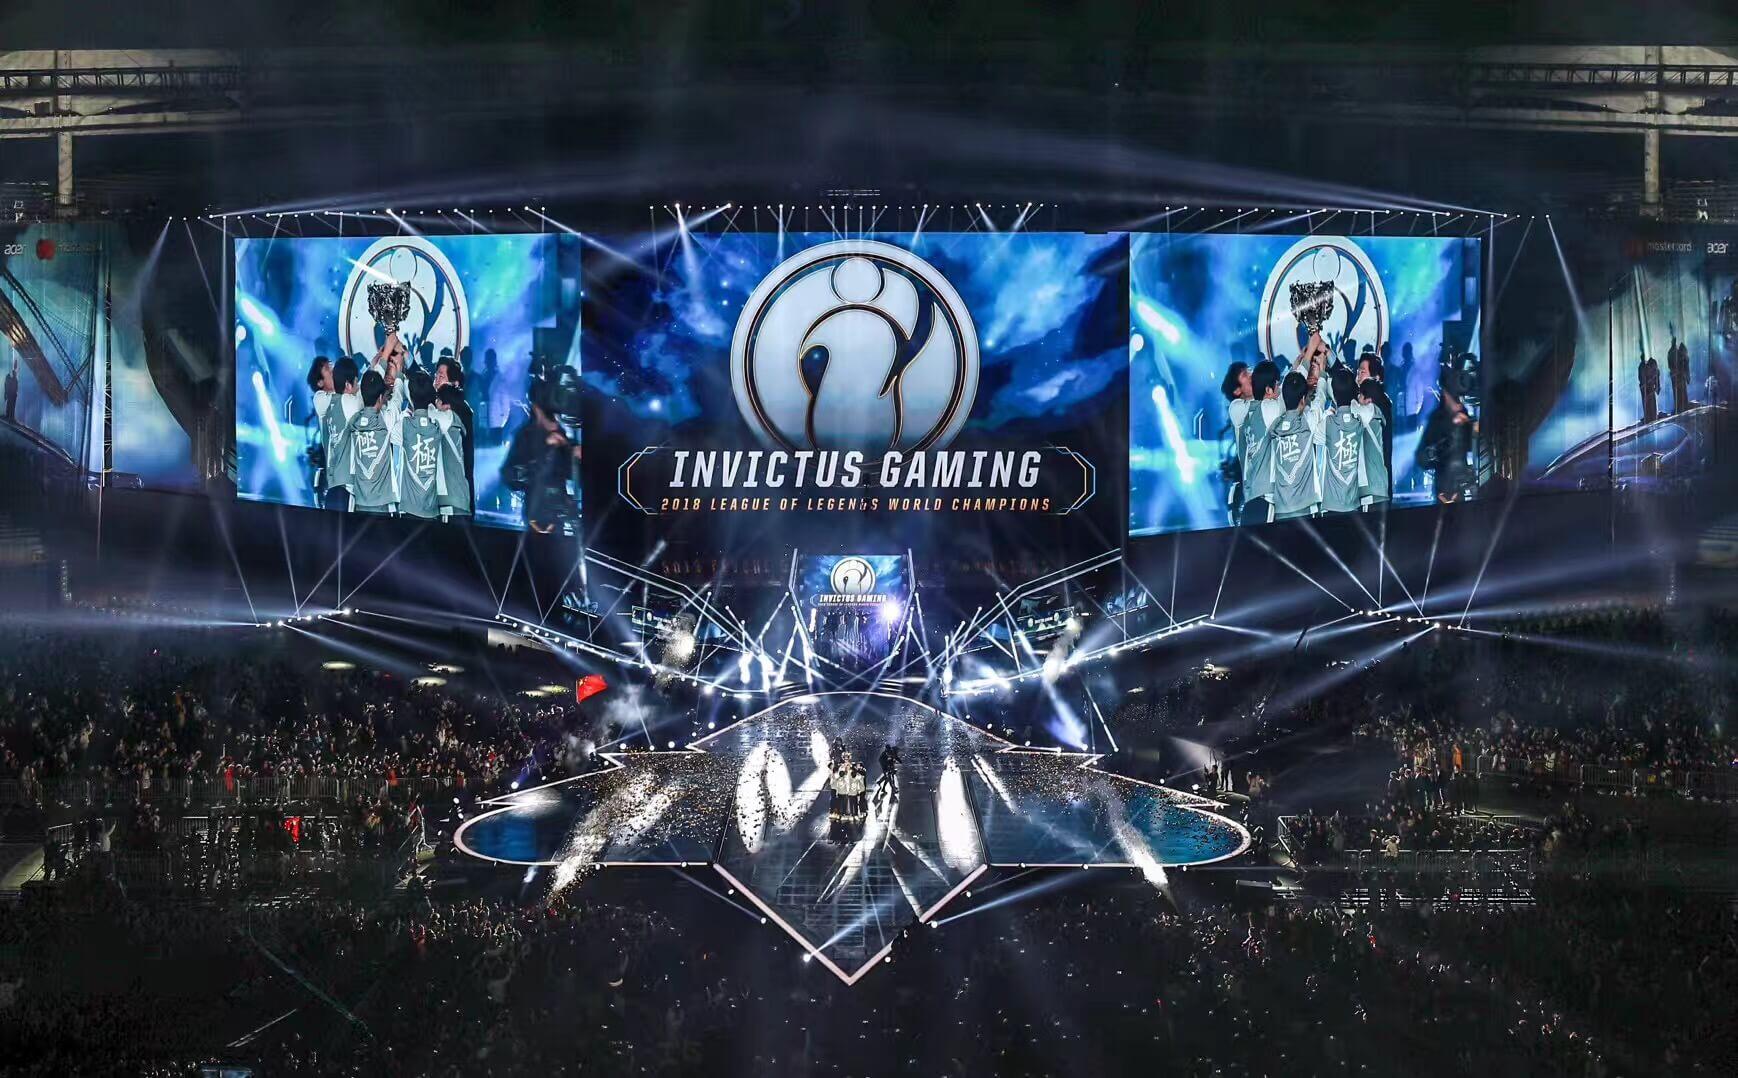 【PentaQ刺猬问答】如何看待 iG 3:0 击败 FNC 夺得 LPL 首个 S 赛世界冠军?